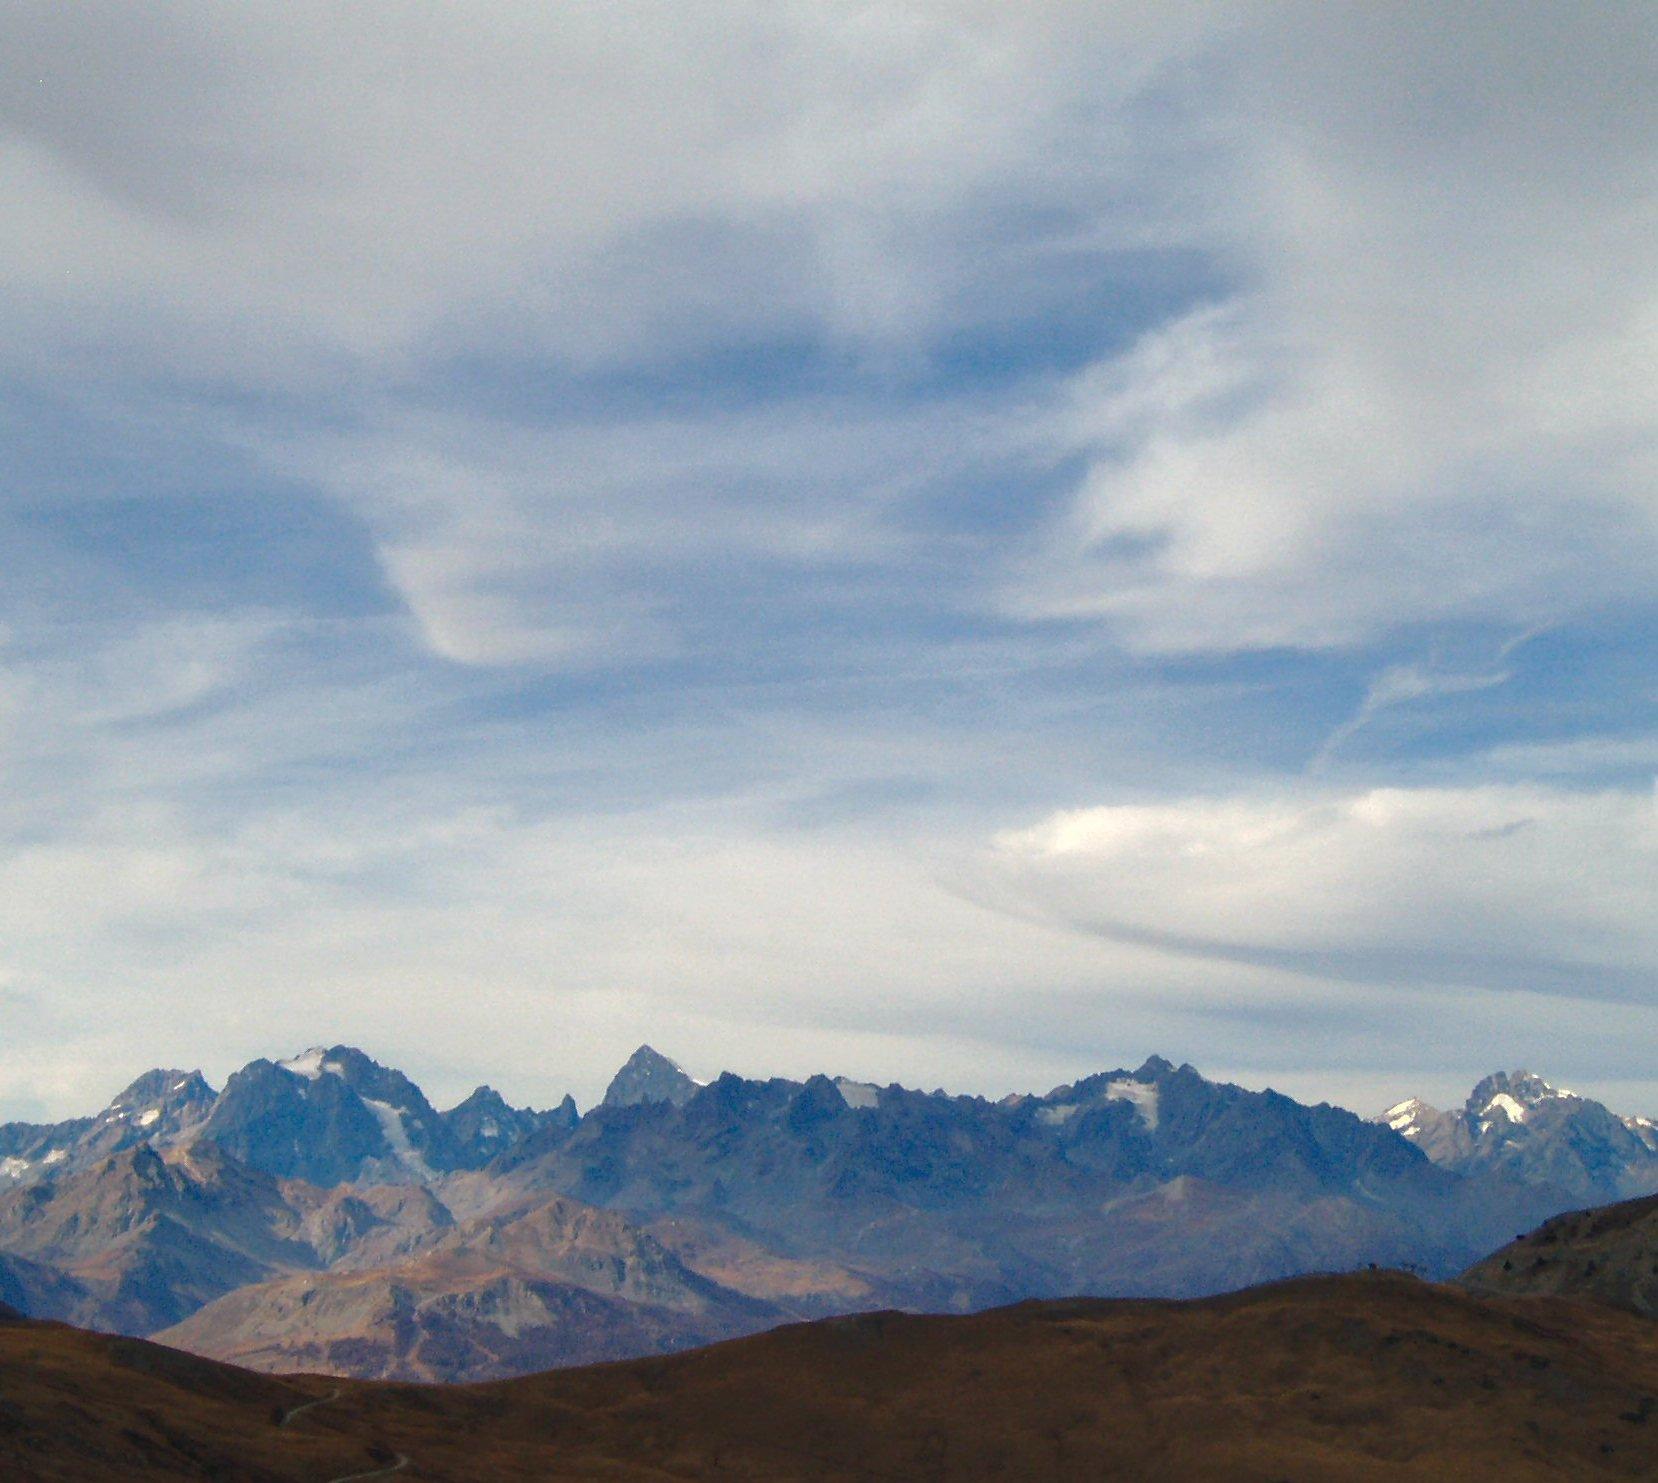 Panorama sul Delfinato con Pelvoux, Barre des Ecrins, Pic des Agneaux e Maije.